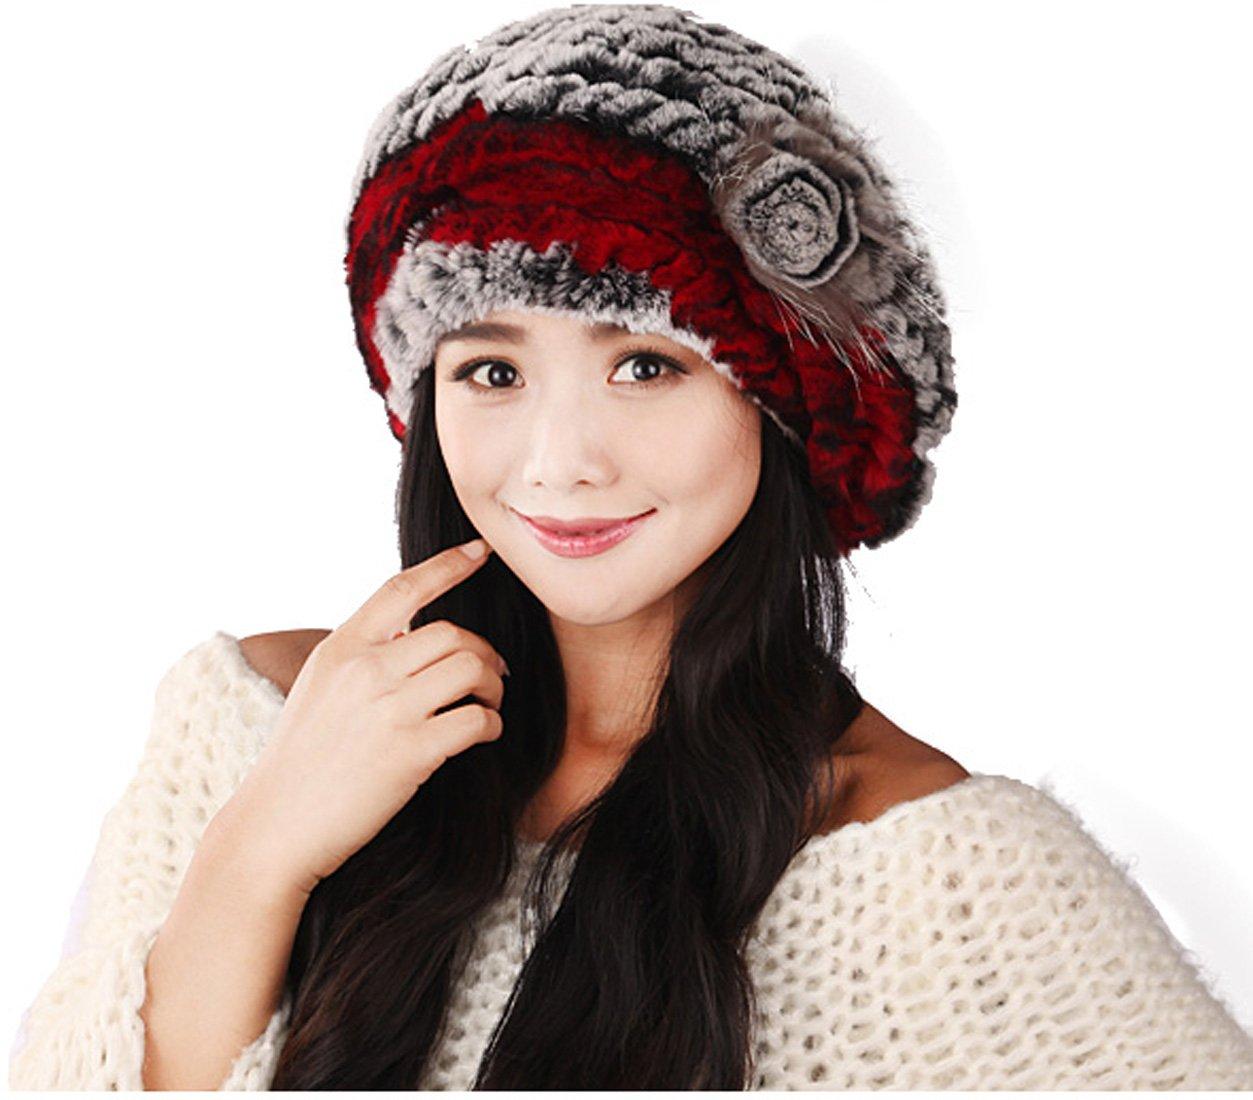 URSFUR Winter Women's Rex Rabbit Fur Beret Hats with Fur Flower (Grey & Red)